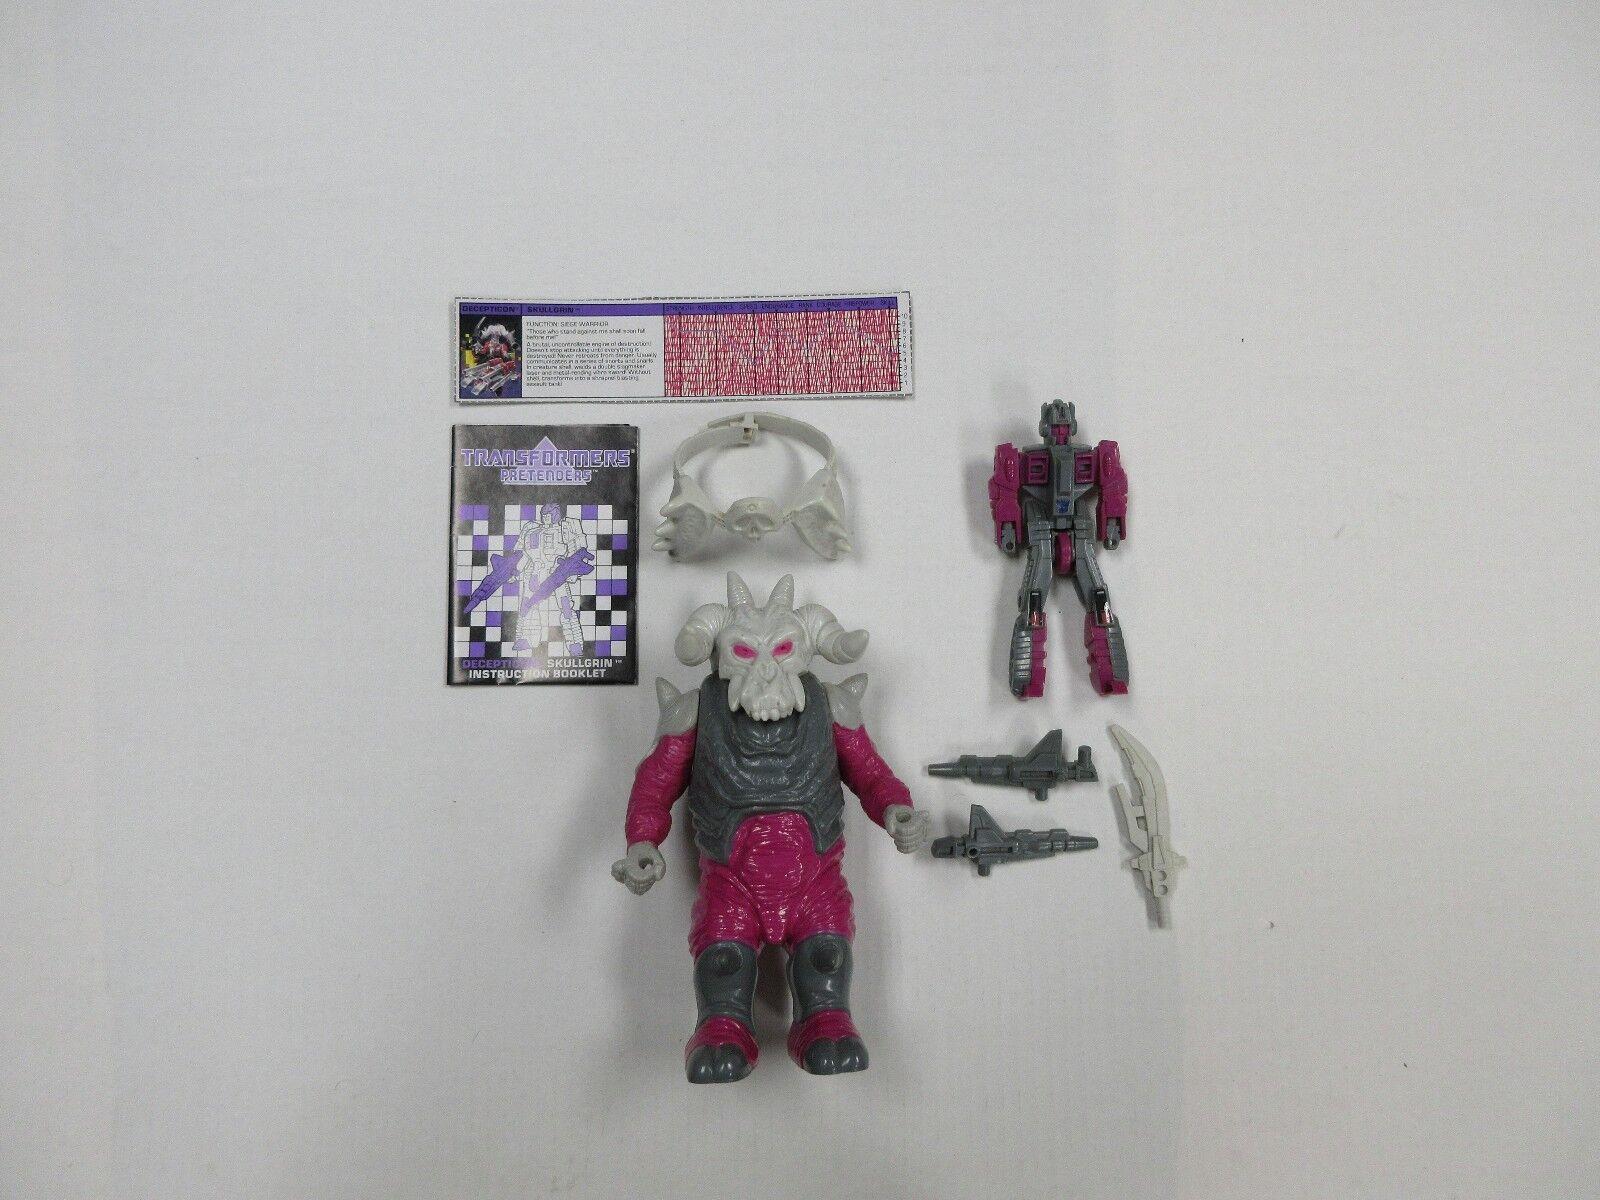 1988 G1 Transformers Pretender Skullgrin 100% complet robot avec instructions  +++  chaud